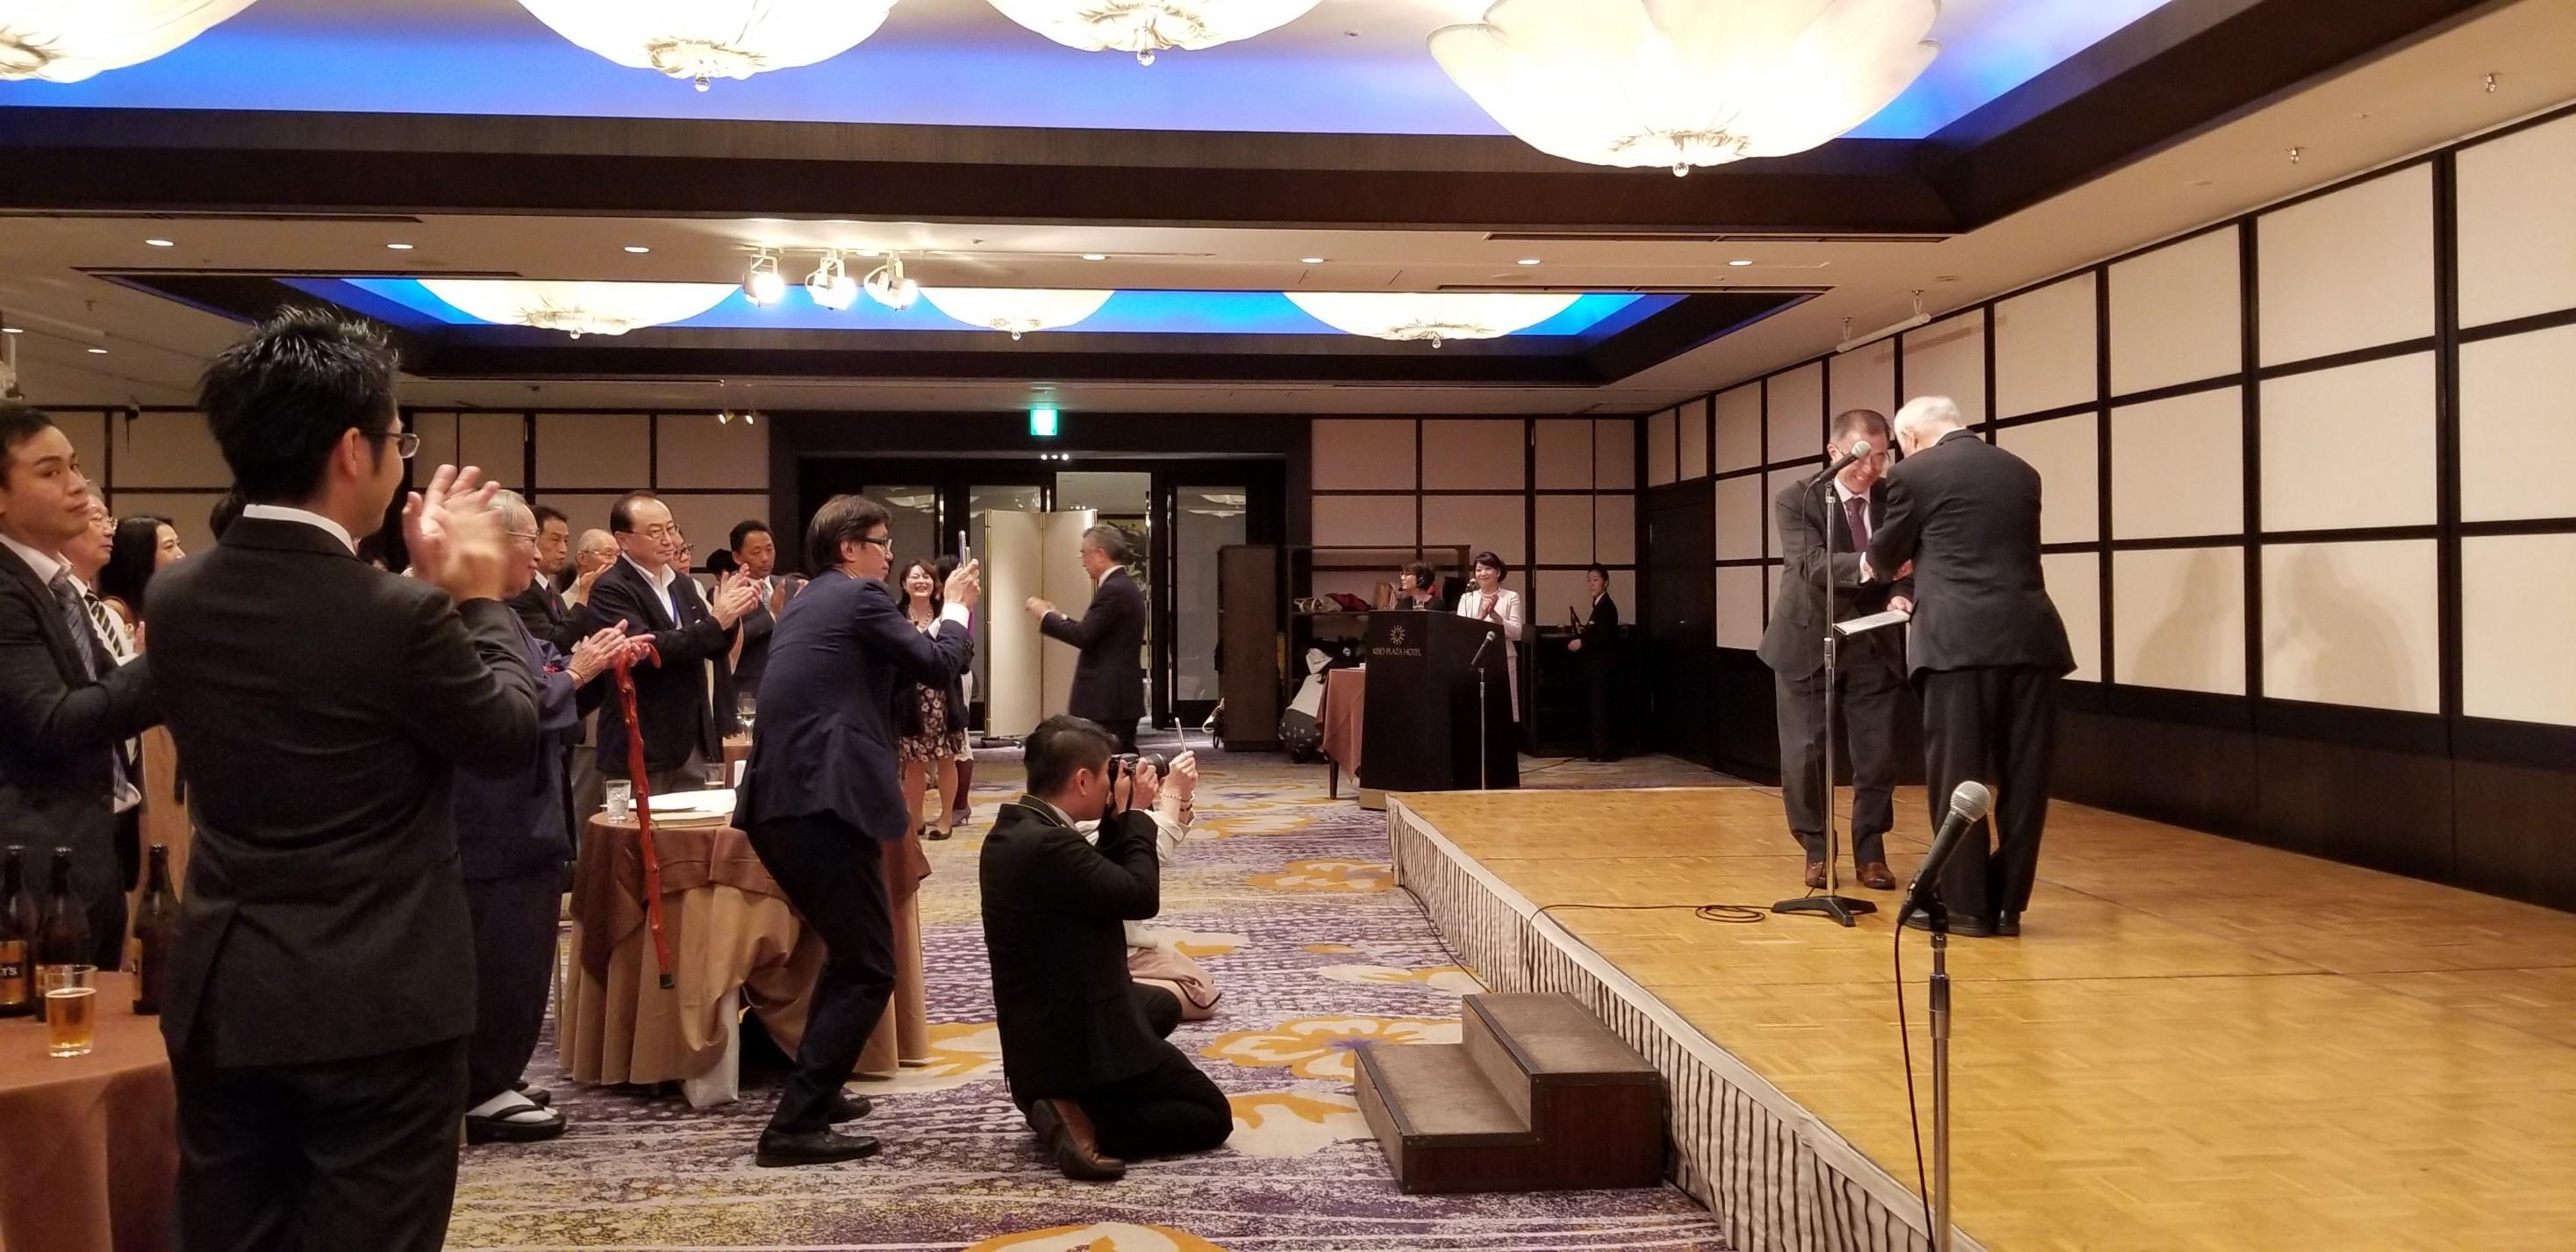 f5851655c4c2ed117aa7e10e55928a61 - 第6回思風会全国大会2018in東京開催